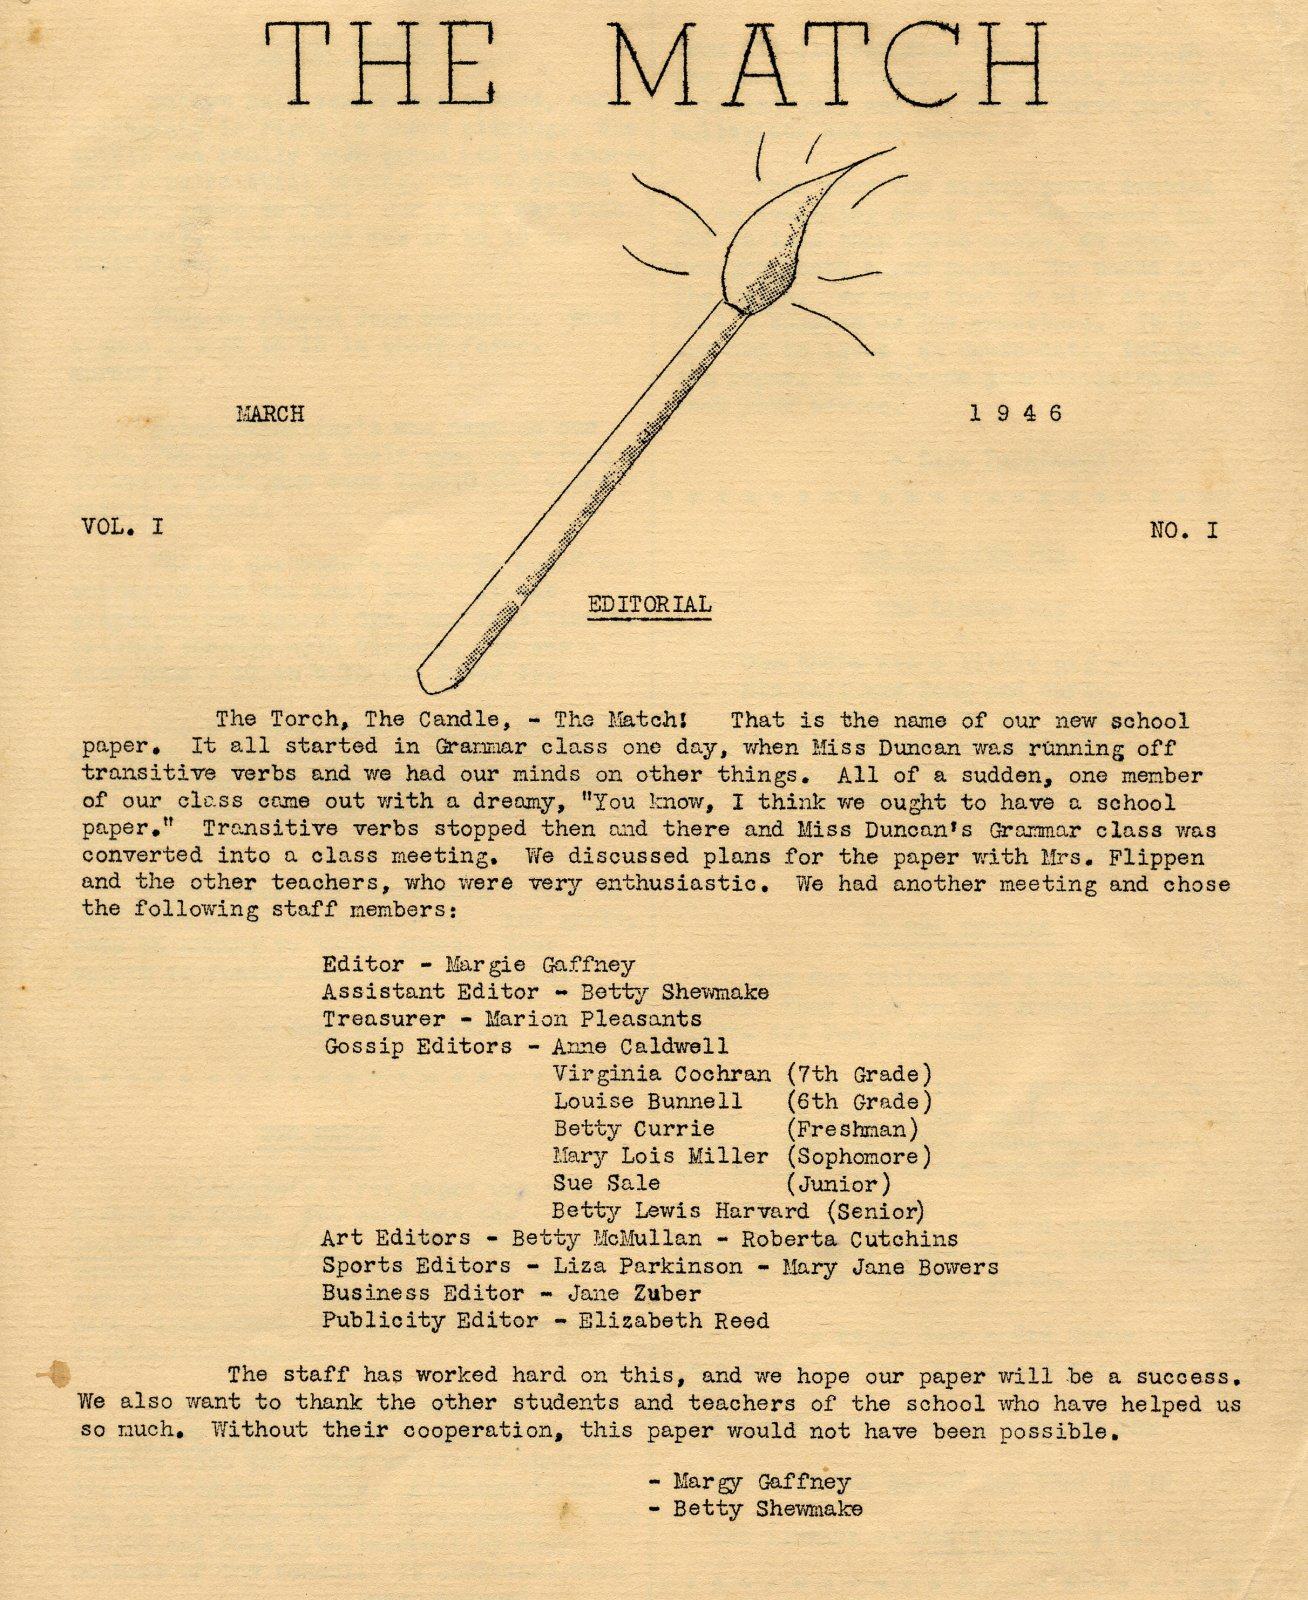 1946 The Match Vol 1 No 1 Page 1